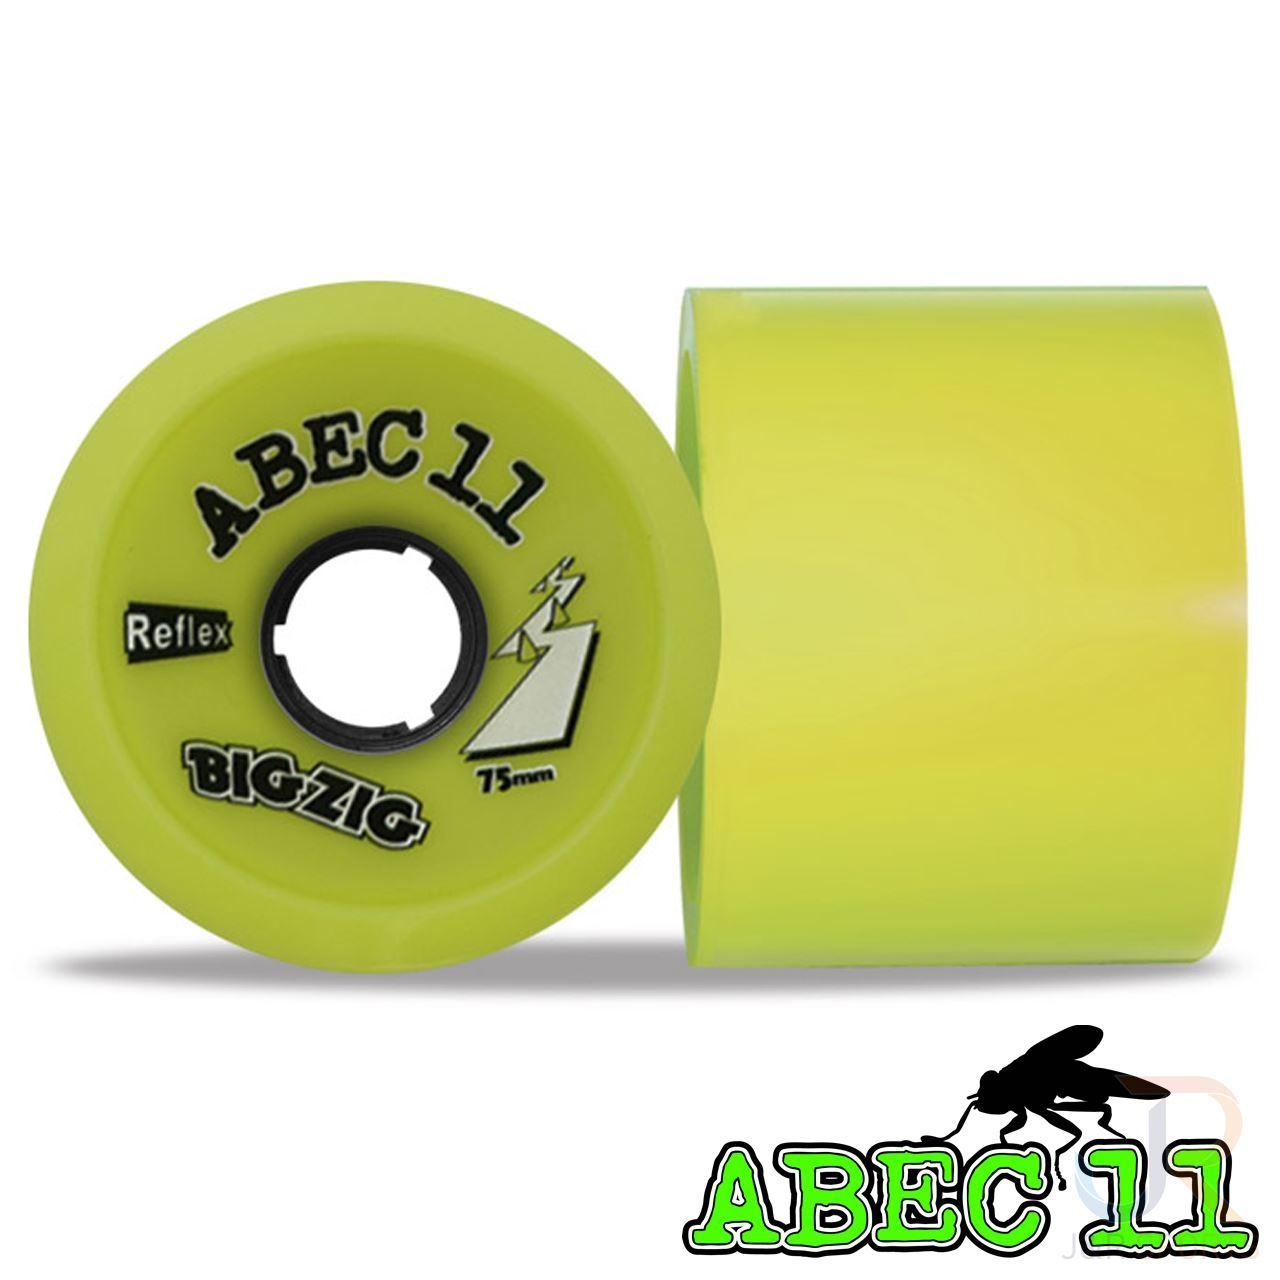 4 Wheels ABEC 11 Reflex BigZig Lemon 83A 75mm Longboard Wheels Set